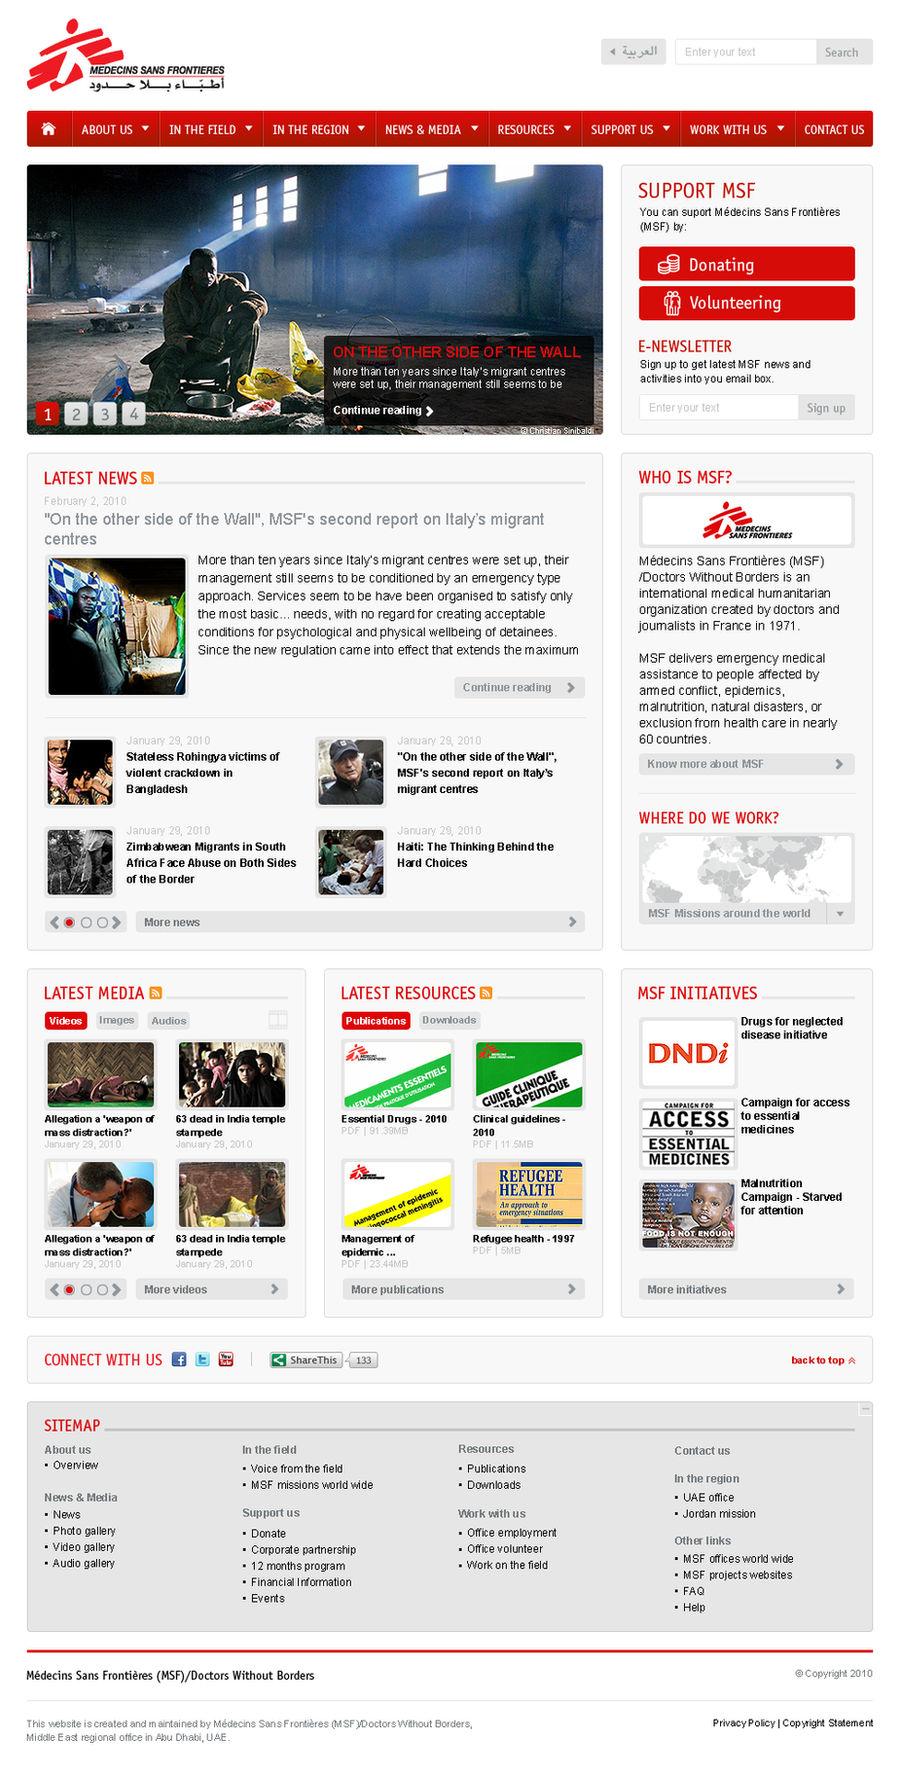 MSF UAE Website Redesign by kono